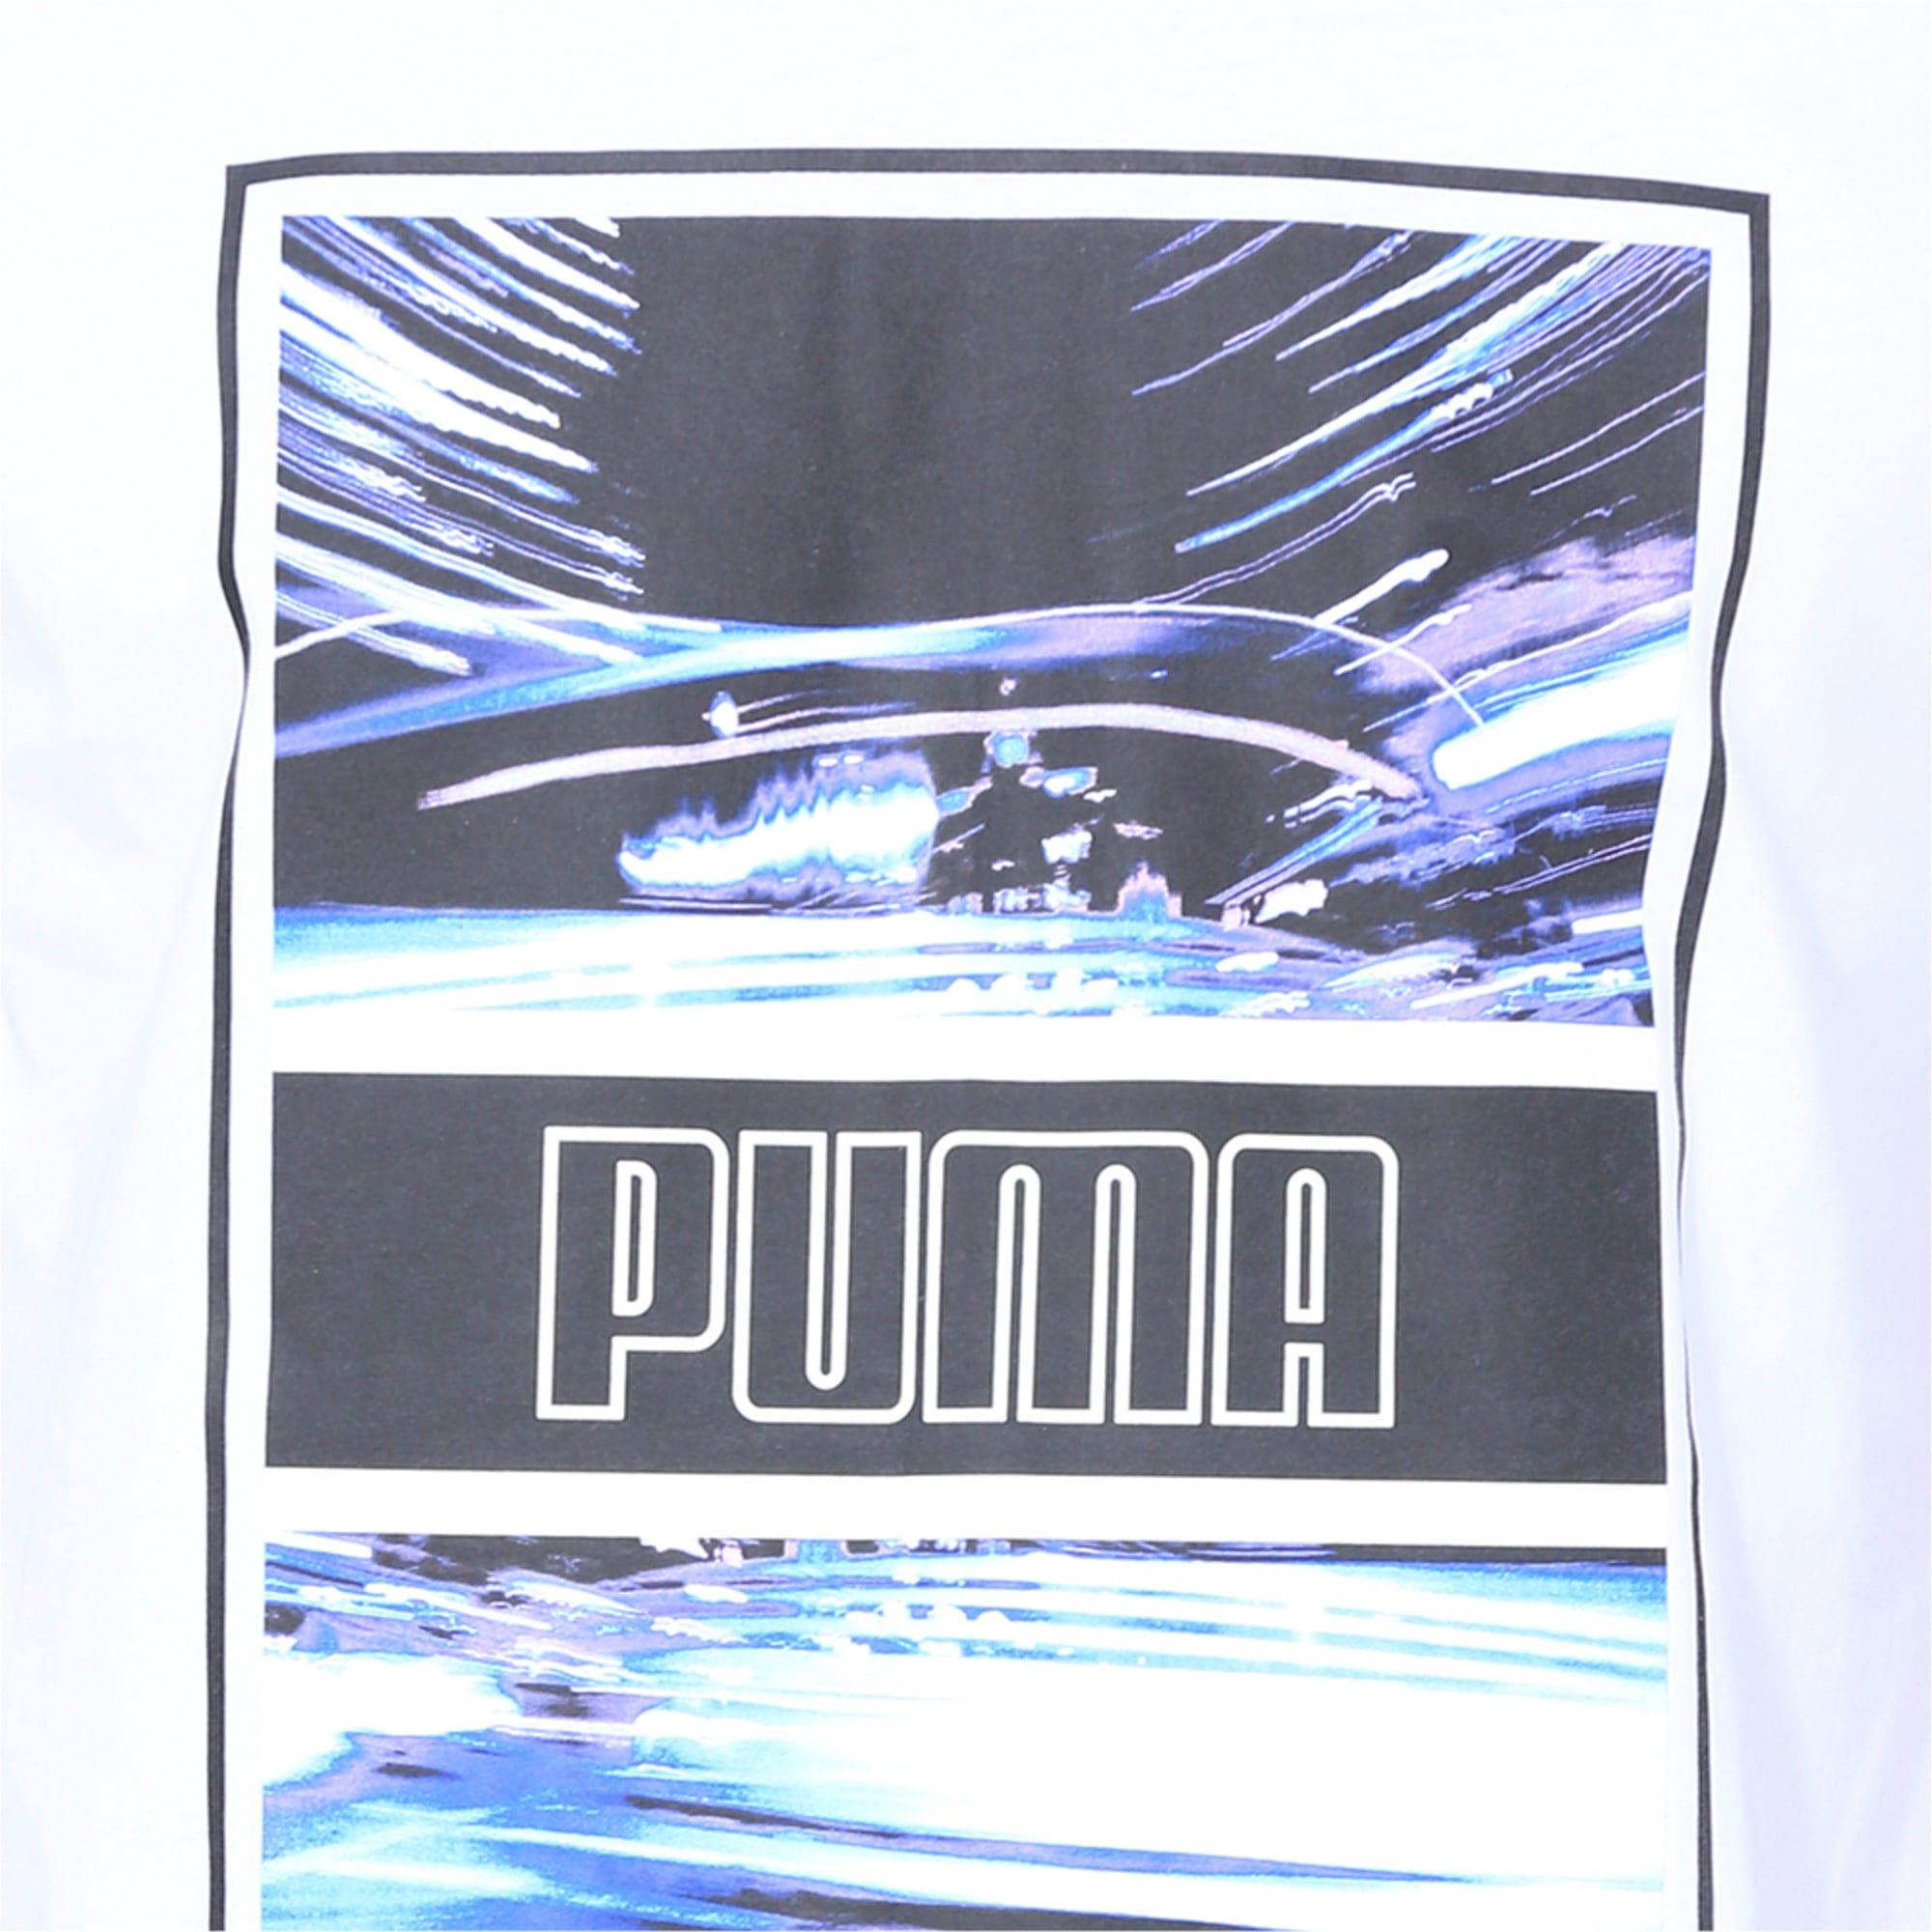 Thumbnail 6 of Light Motion Photo Men's Tee, Puma White, medium-IND